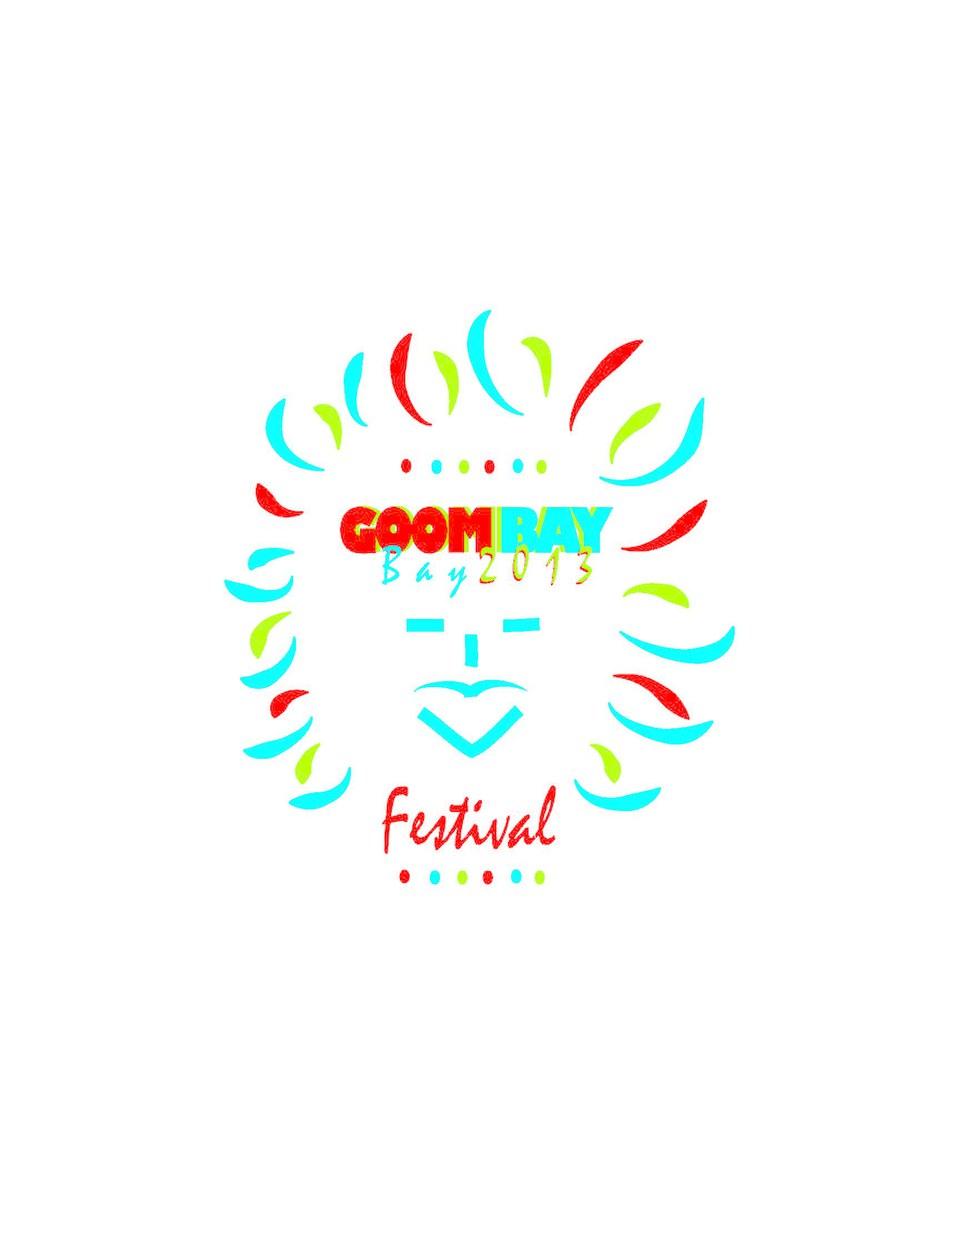 Goombay Festival Logo